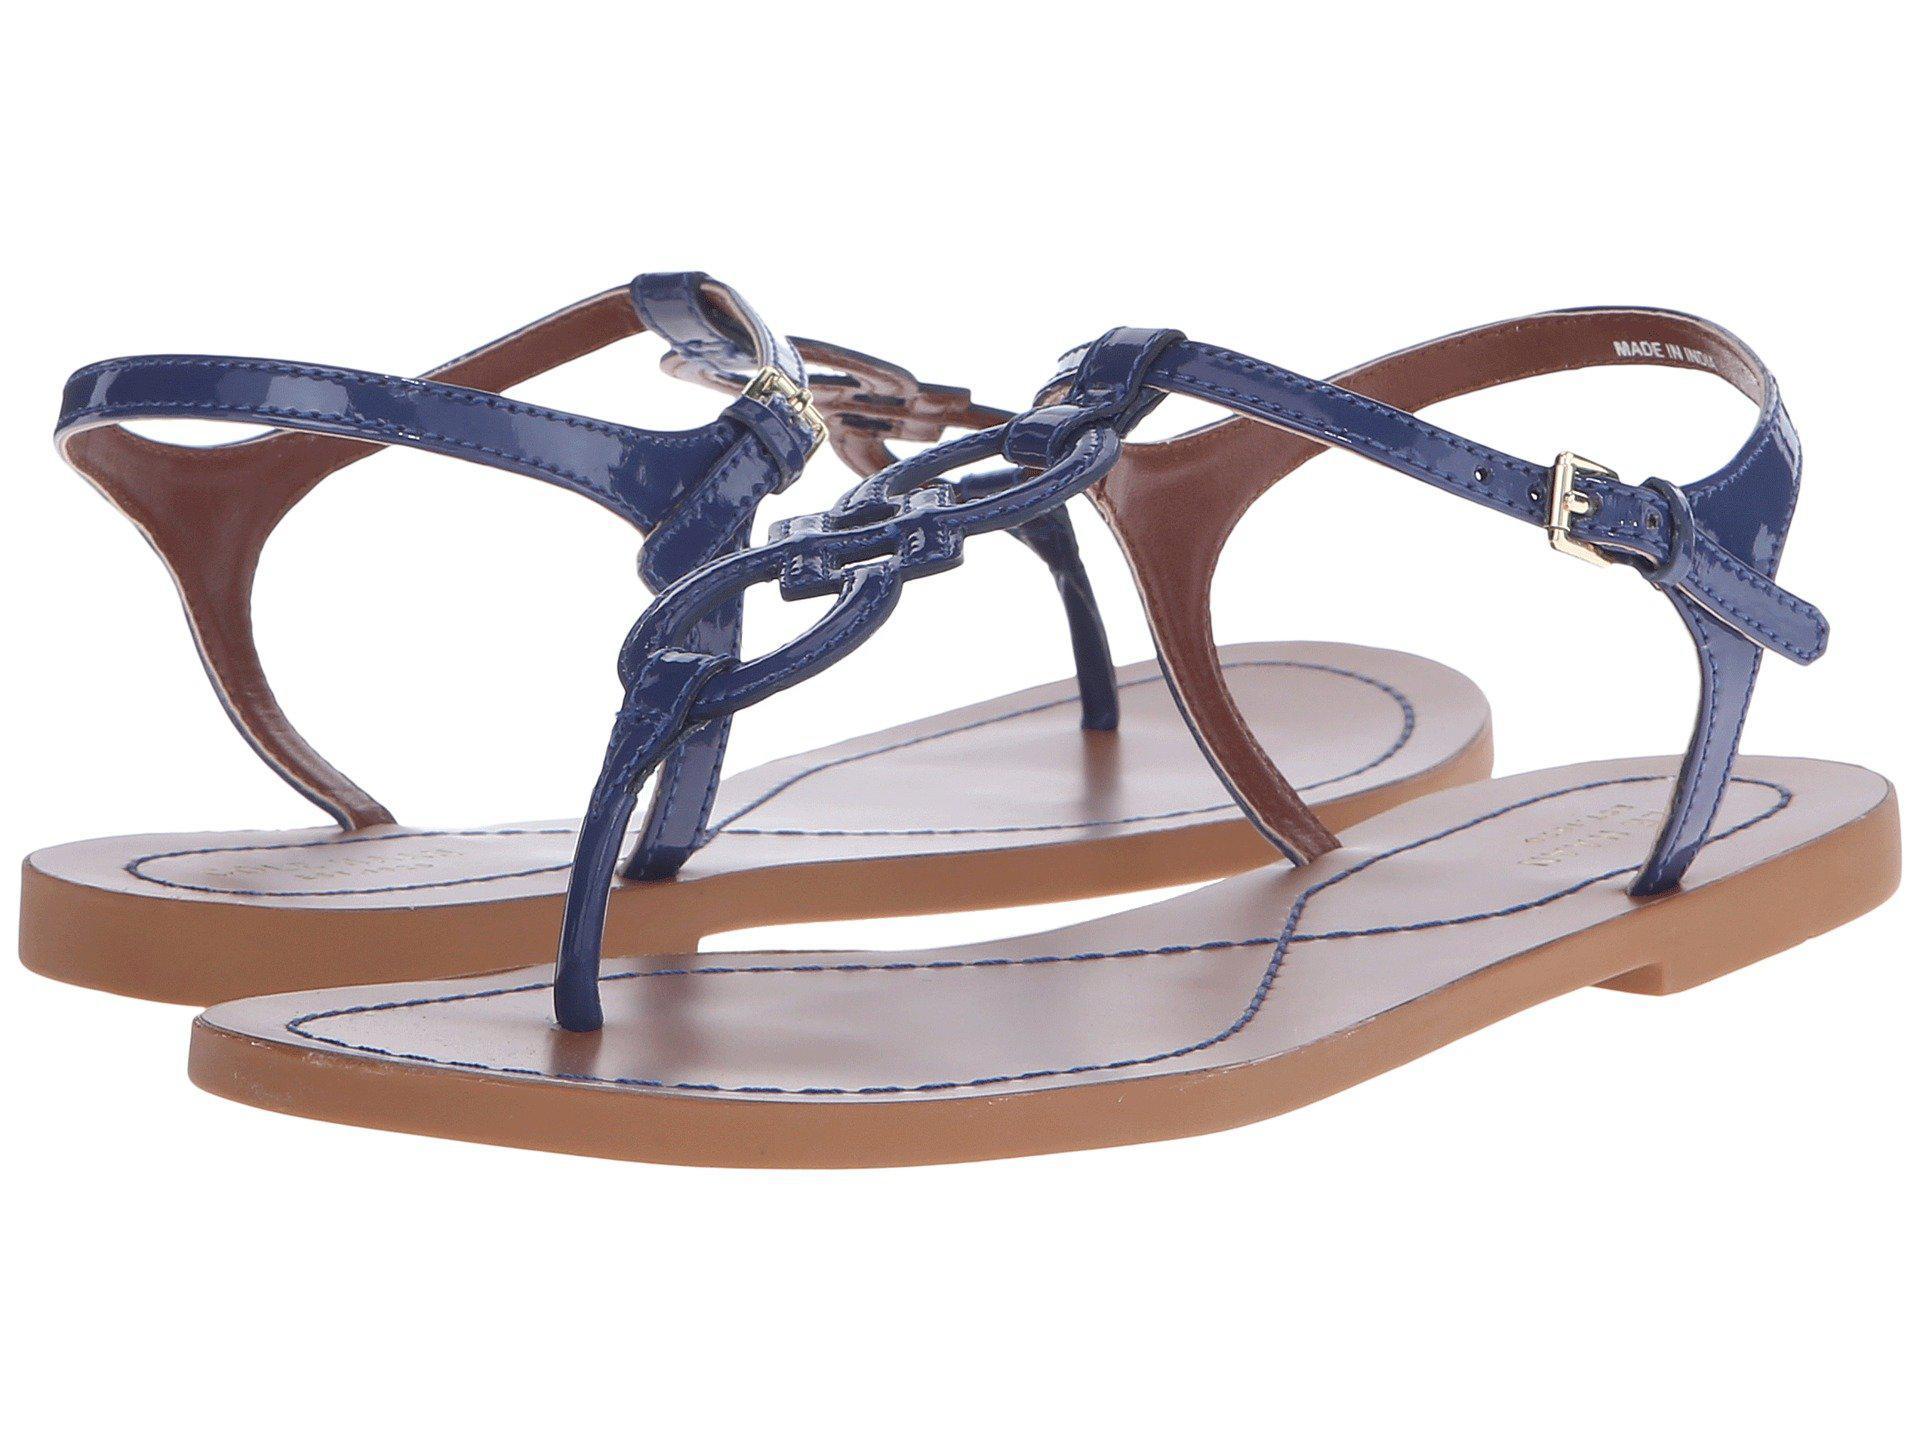 ff750c6d2e3 Lyst - Cole Haan Iris Sandal in Blue